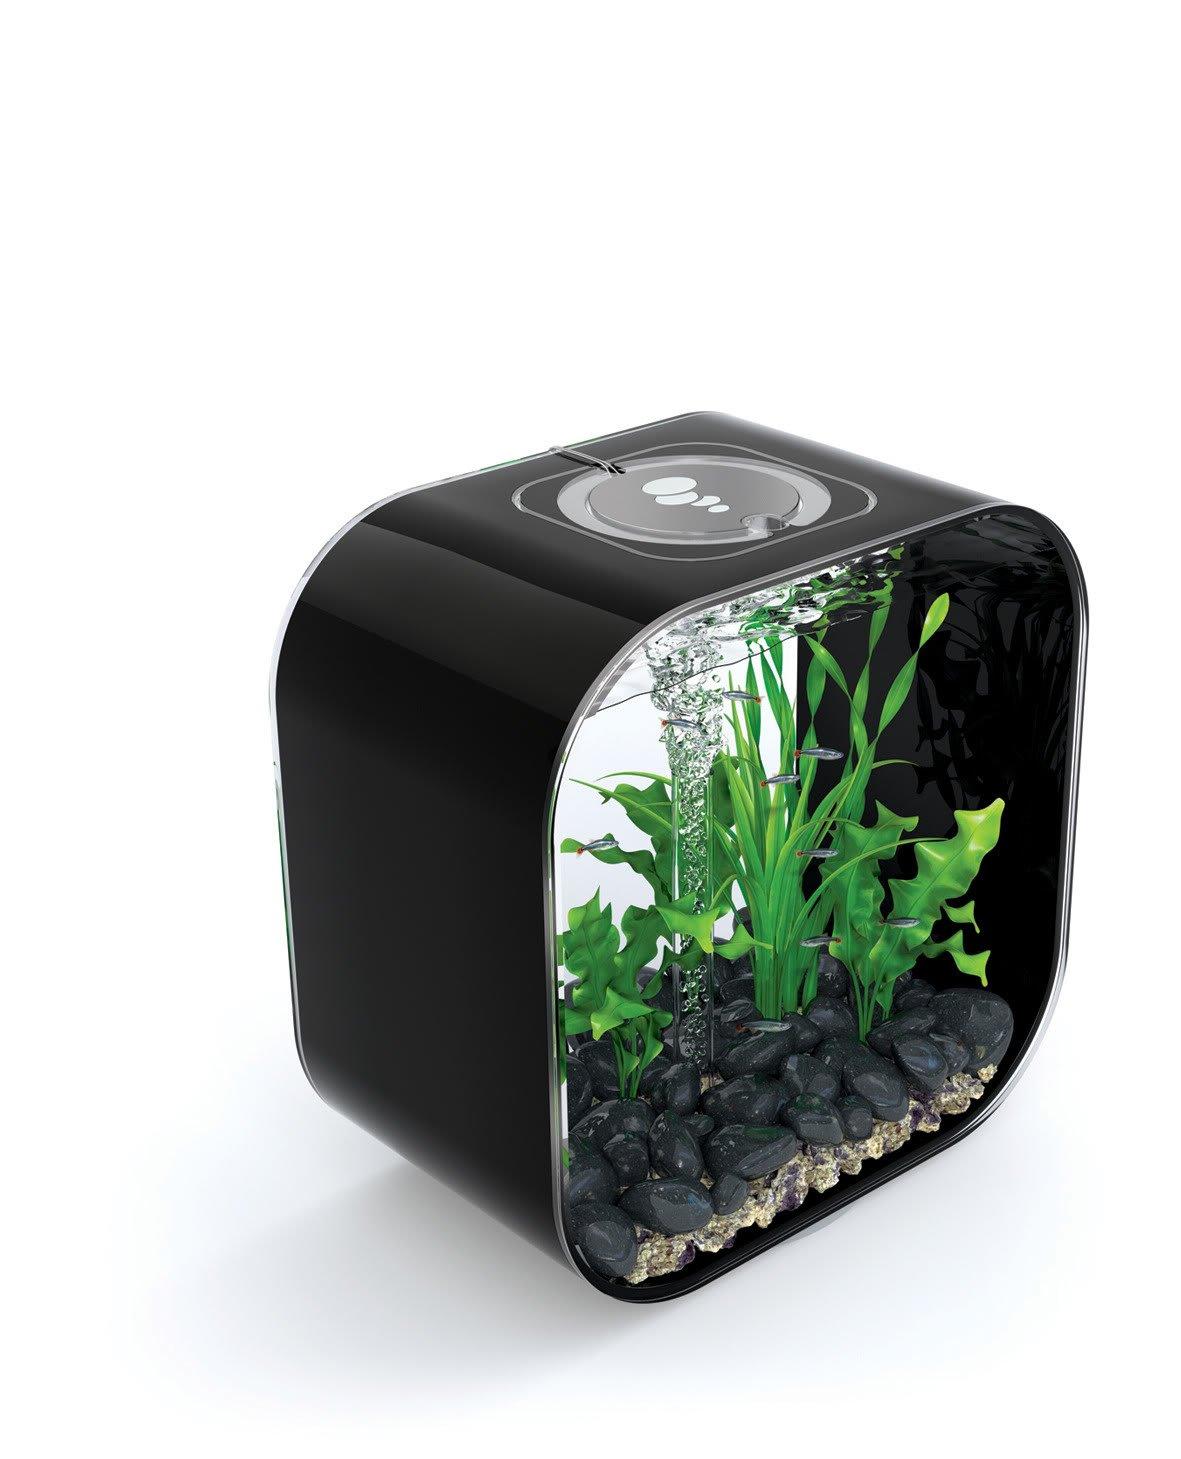 Black biOrb Life Square 30 Cold Water, Black, Intelligent 24hr LED Light